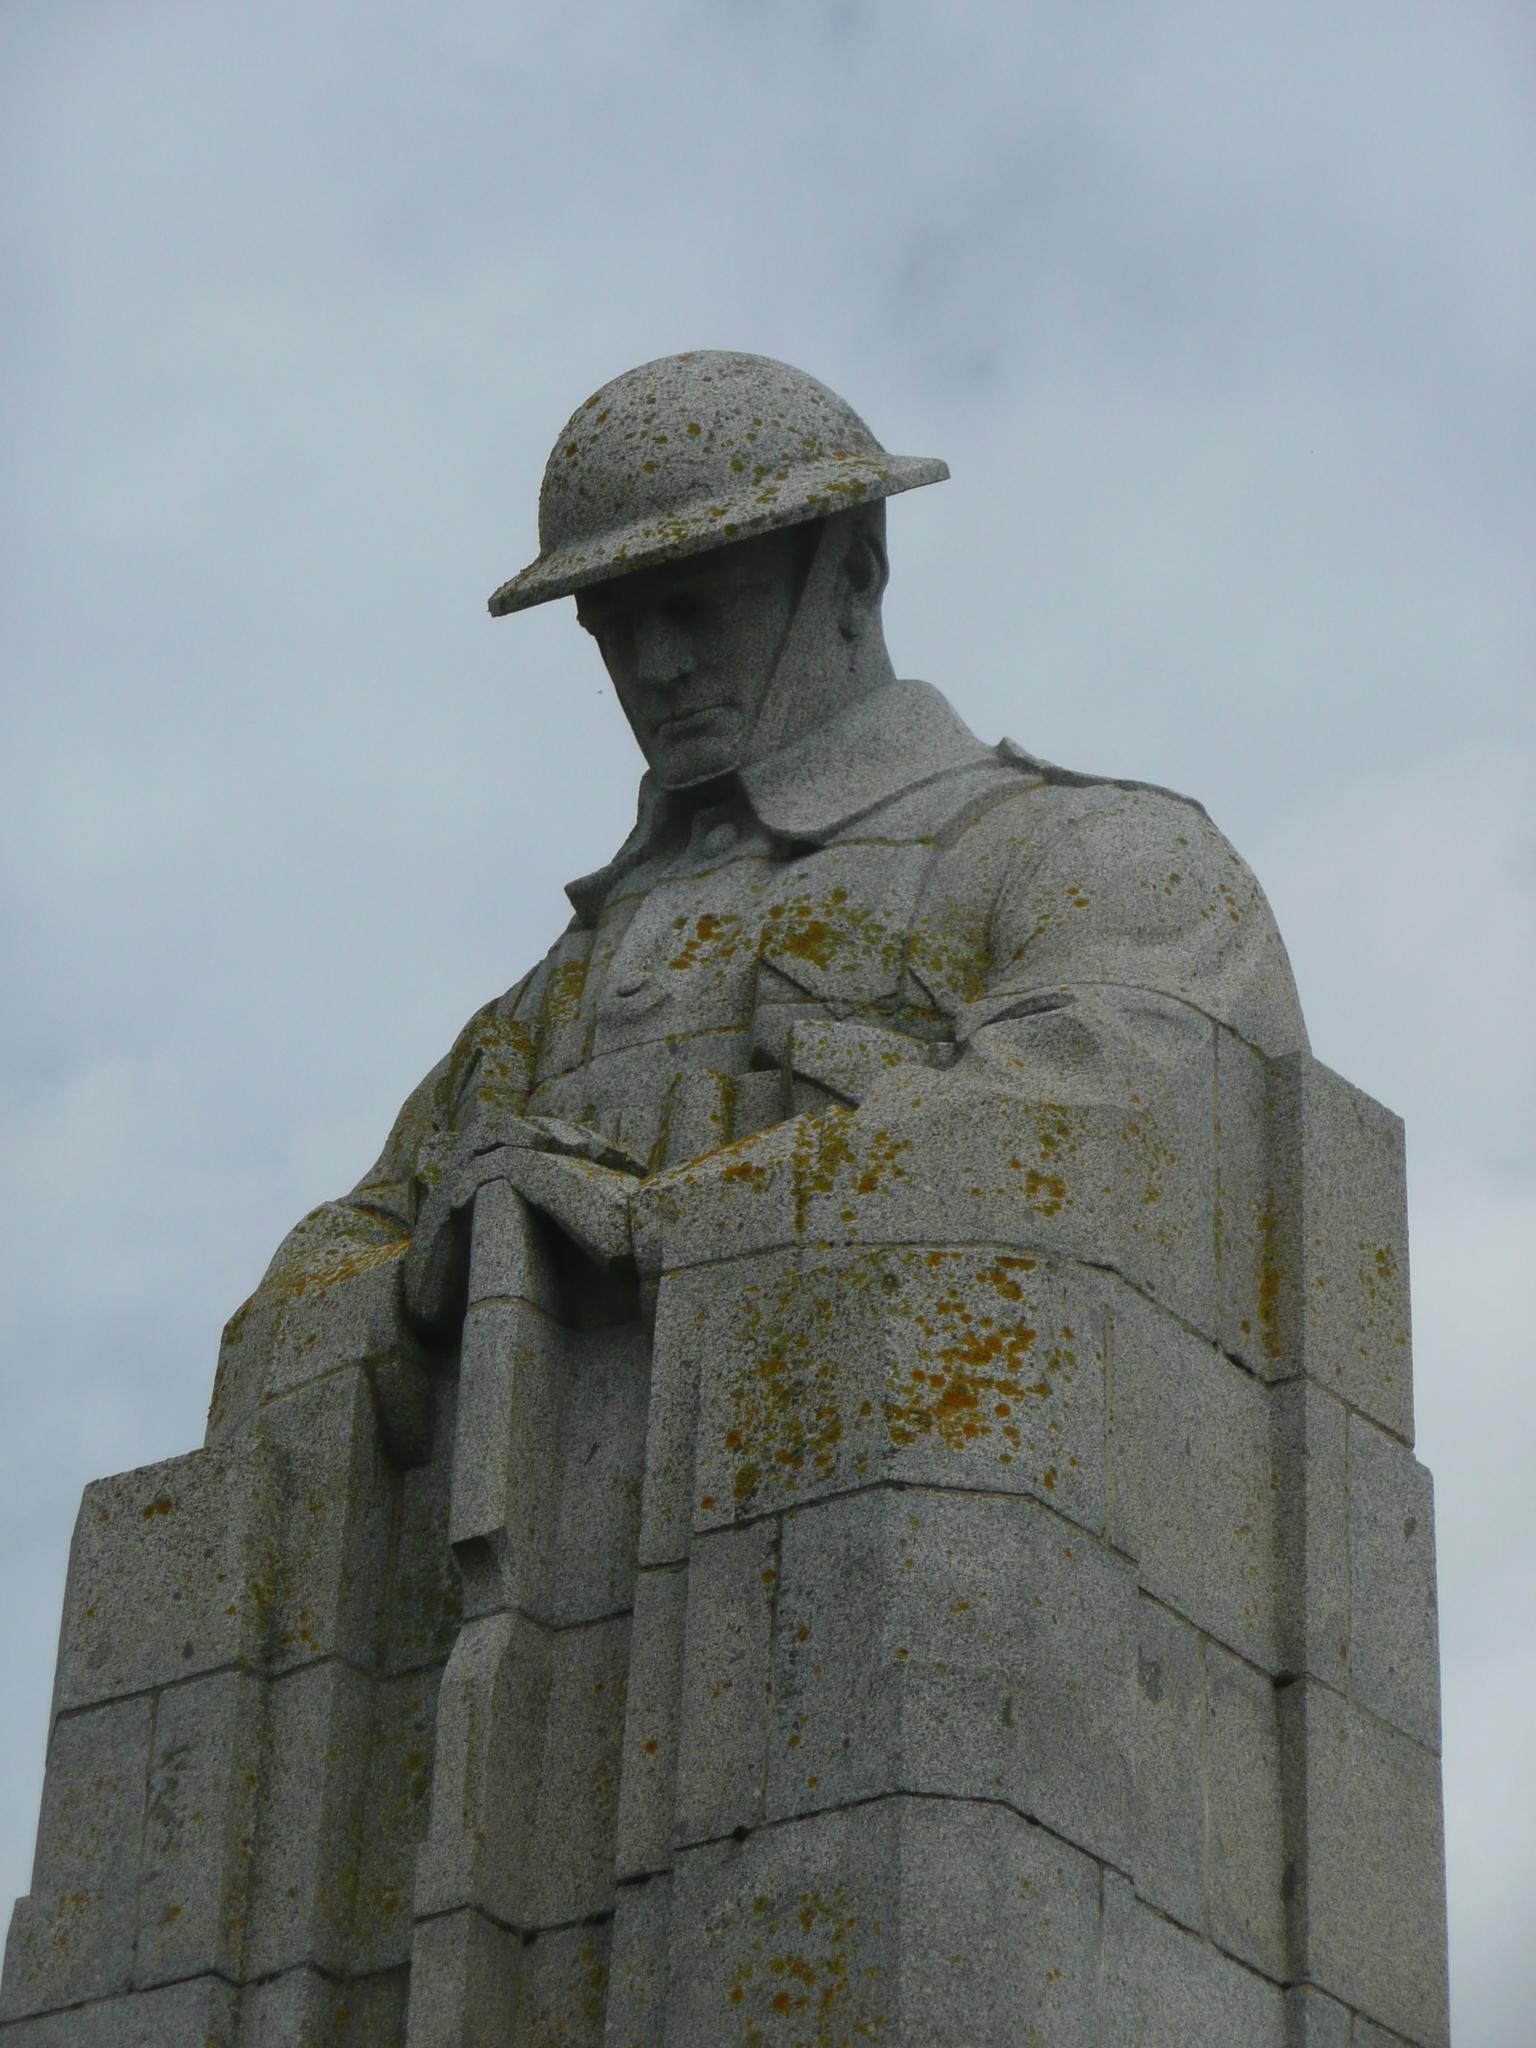 Vimy Memorial in France by John Purificati